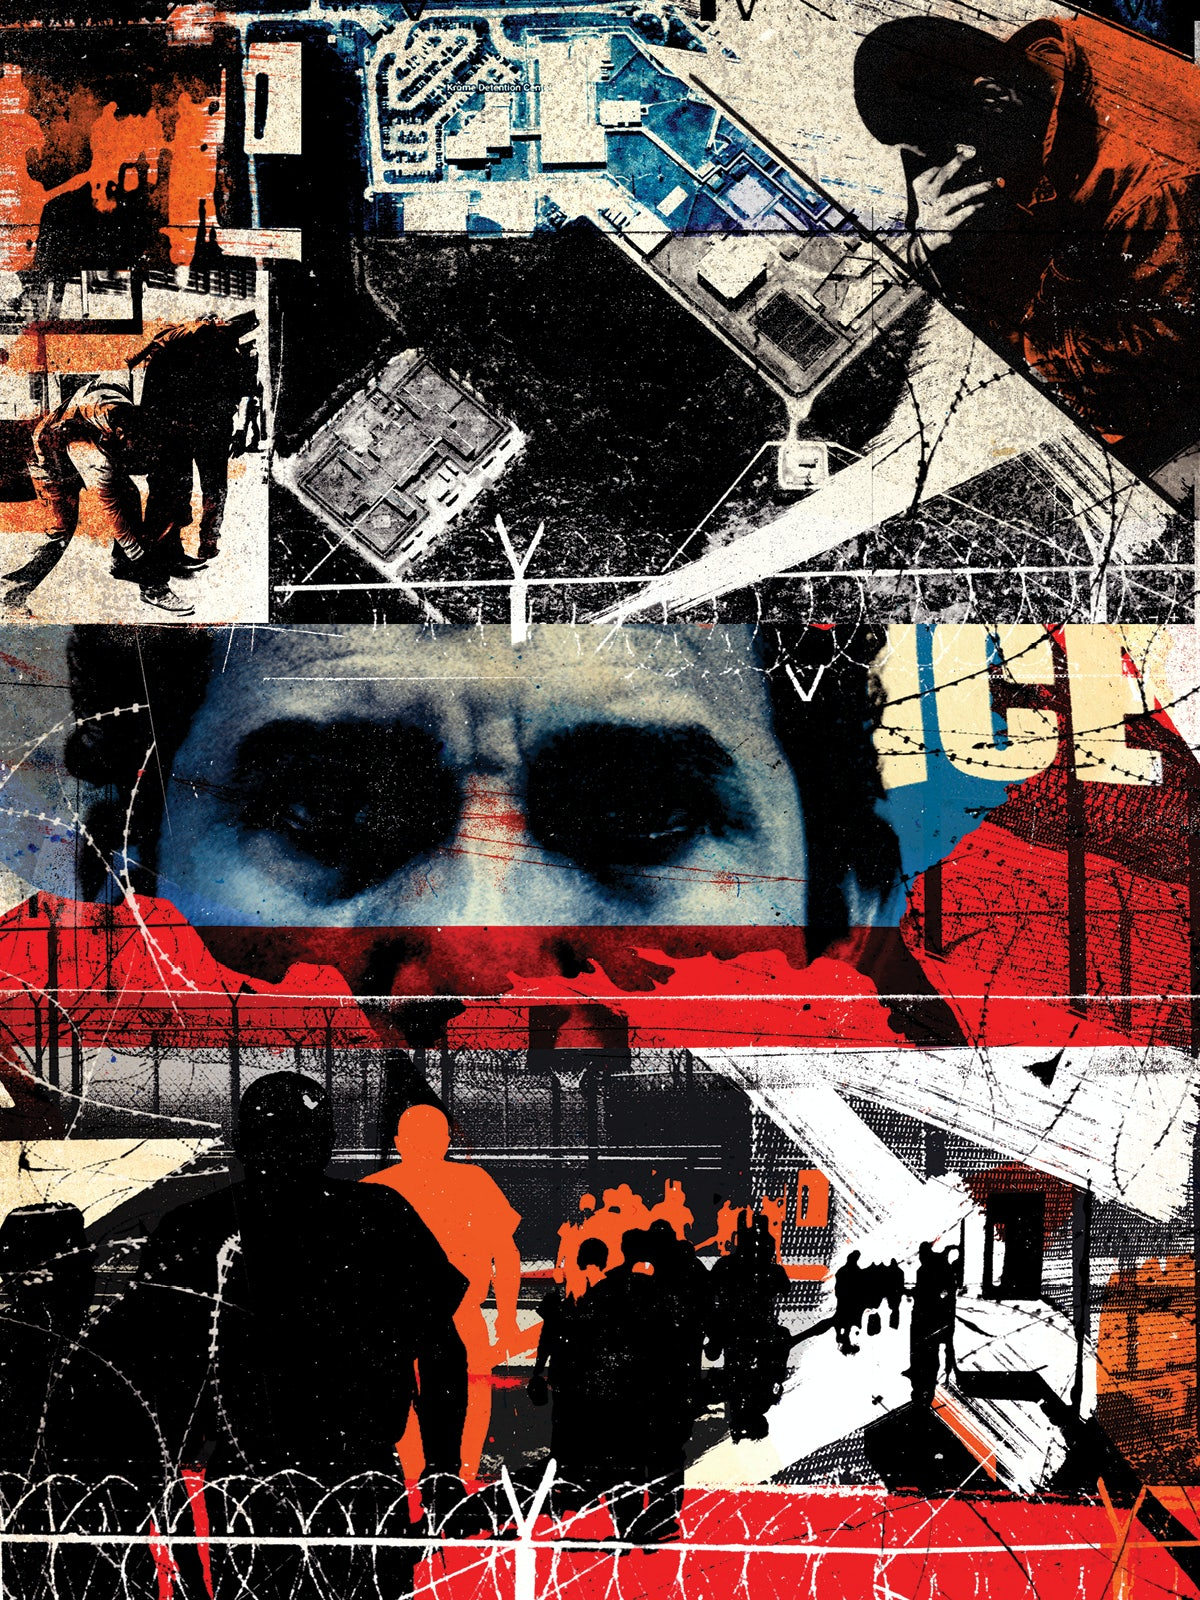 Shock Corridor | The New Republic